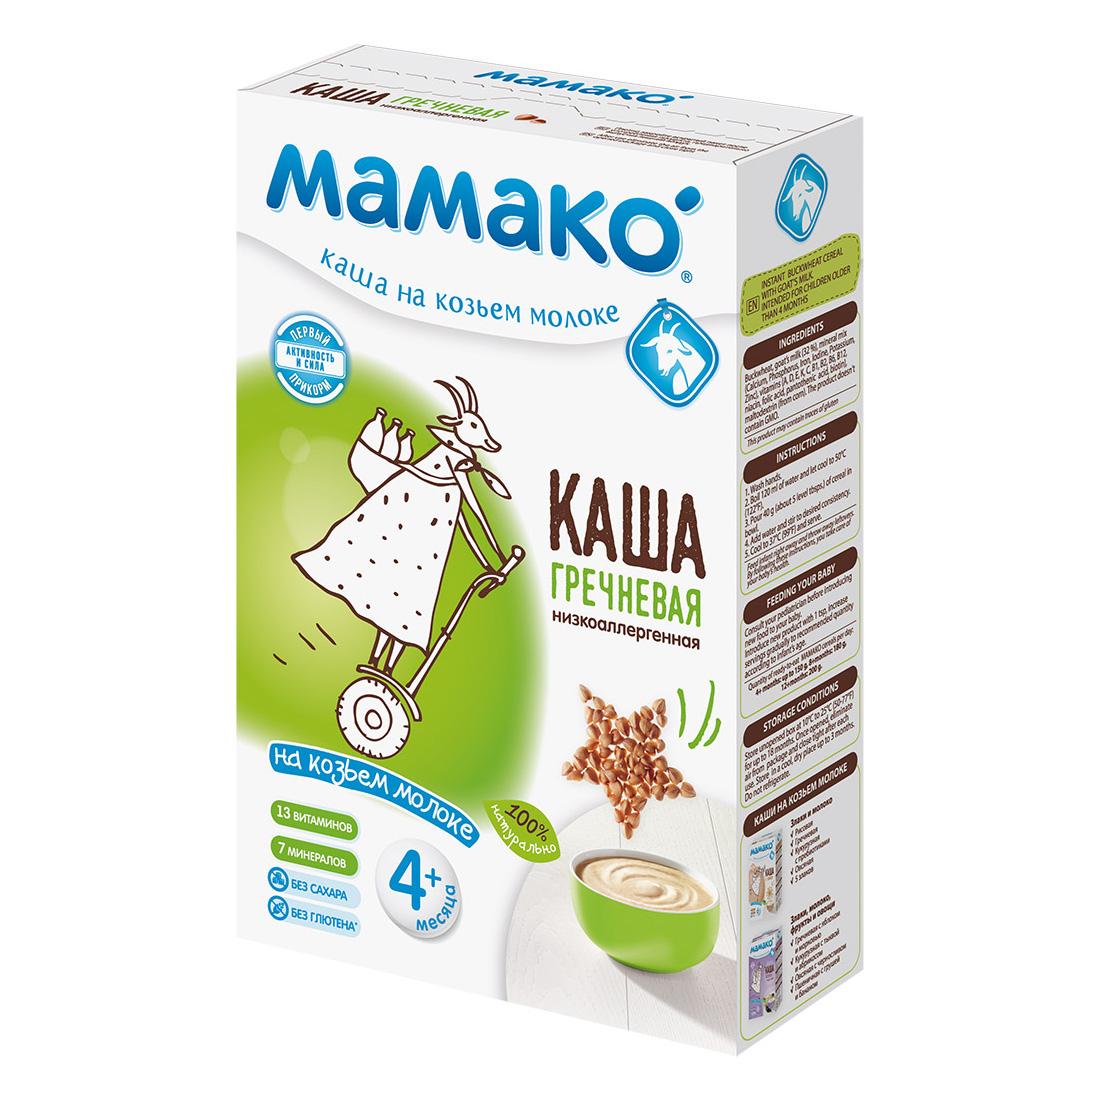 Каша Mamako на козьем молоке 200 гр Гречневая  (с 4 мес)<br>